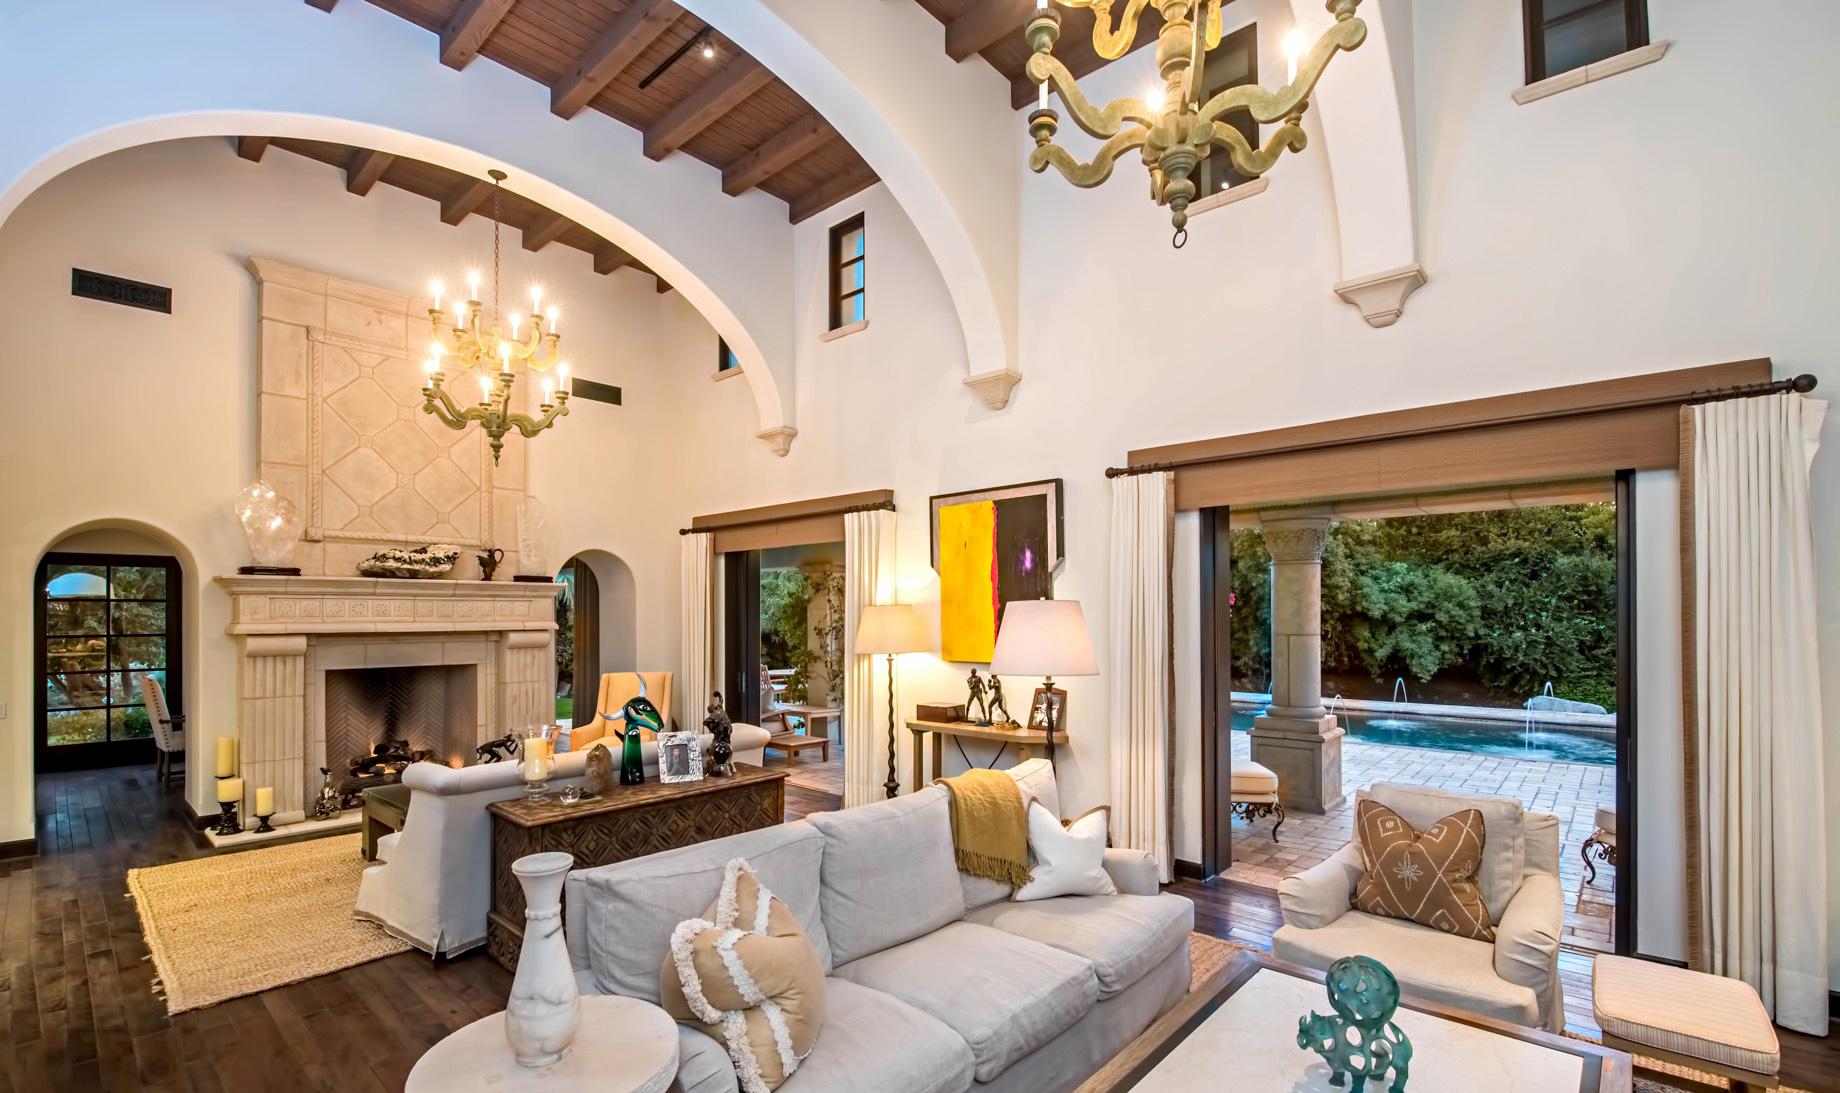 Sylvester Stallone Residence – Humboldt Blvd, La Quinta, CA, USA